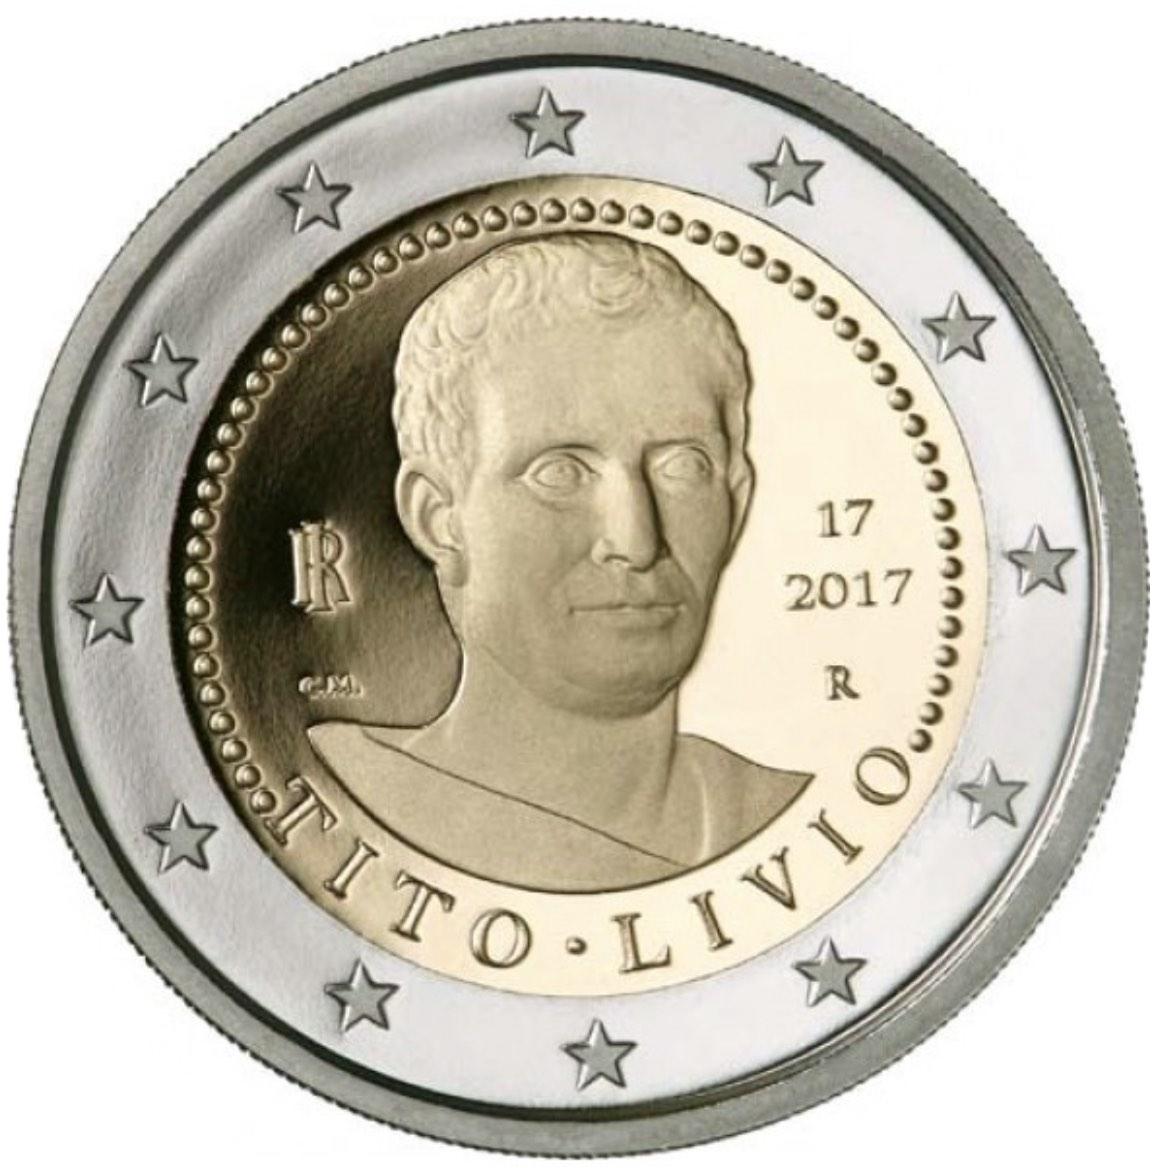 italie 2 euro comm morative 2017 valeur des pi ces de 2 euro. Black Bedroom Furniture Sets. Home Design Ideas